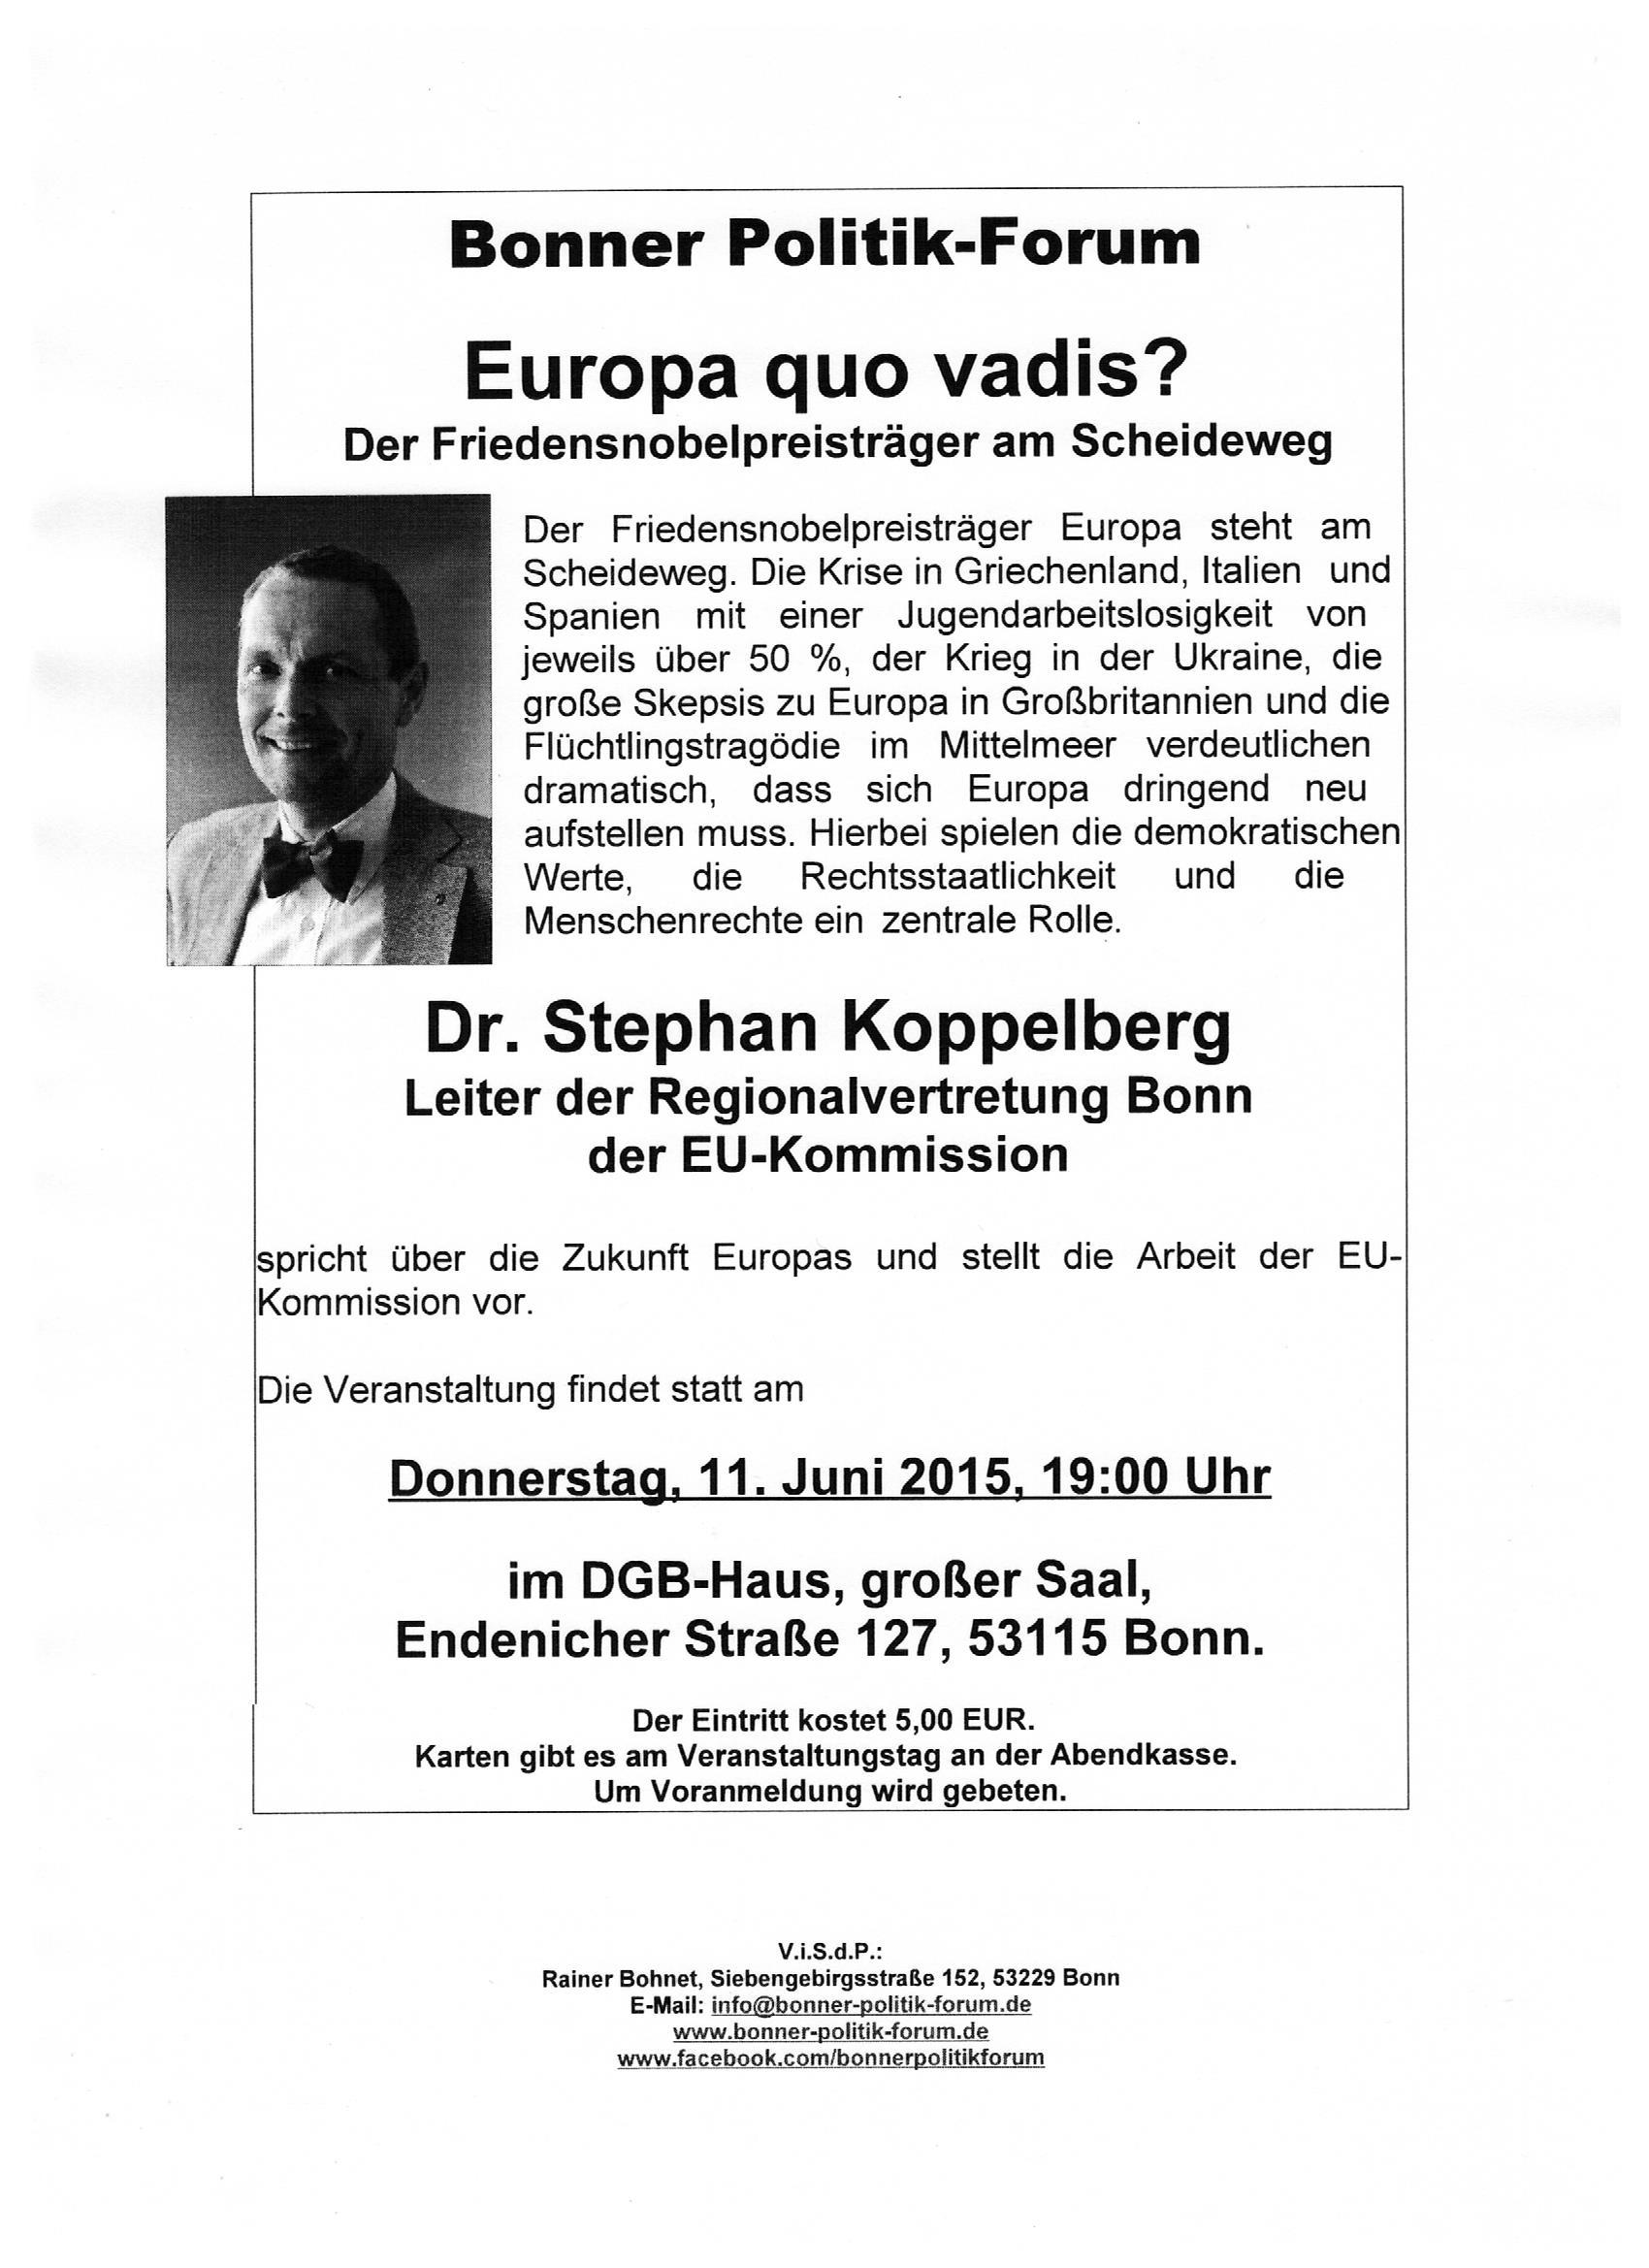 Europa quo vadis